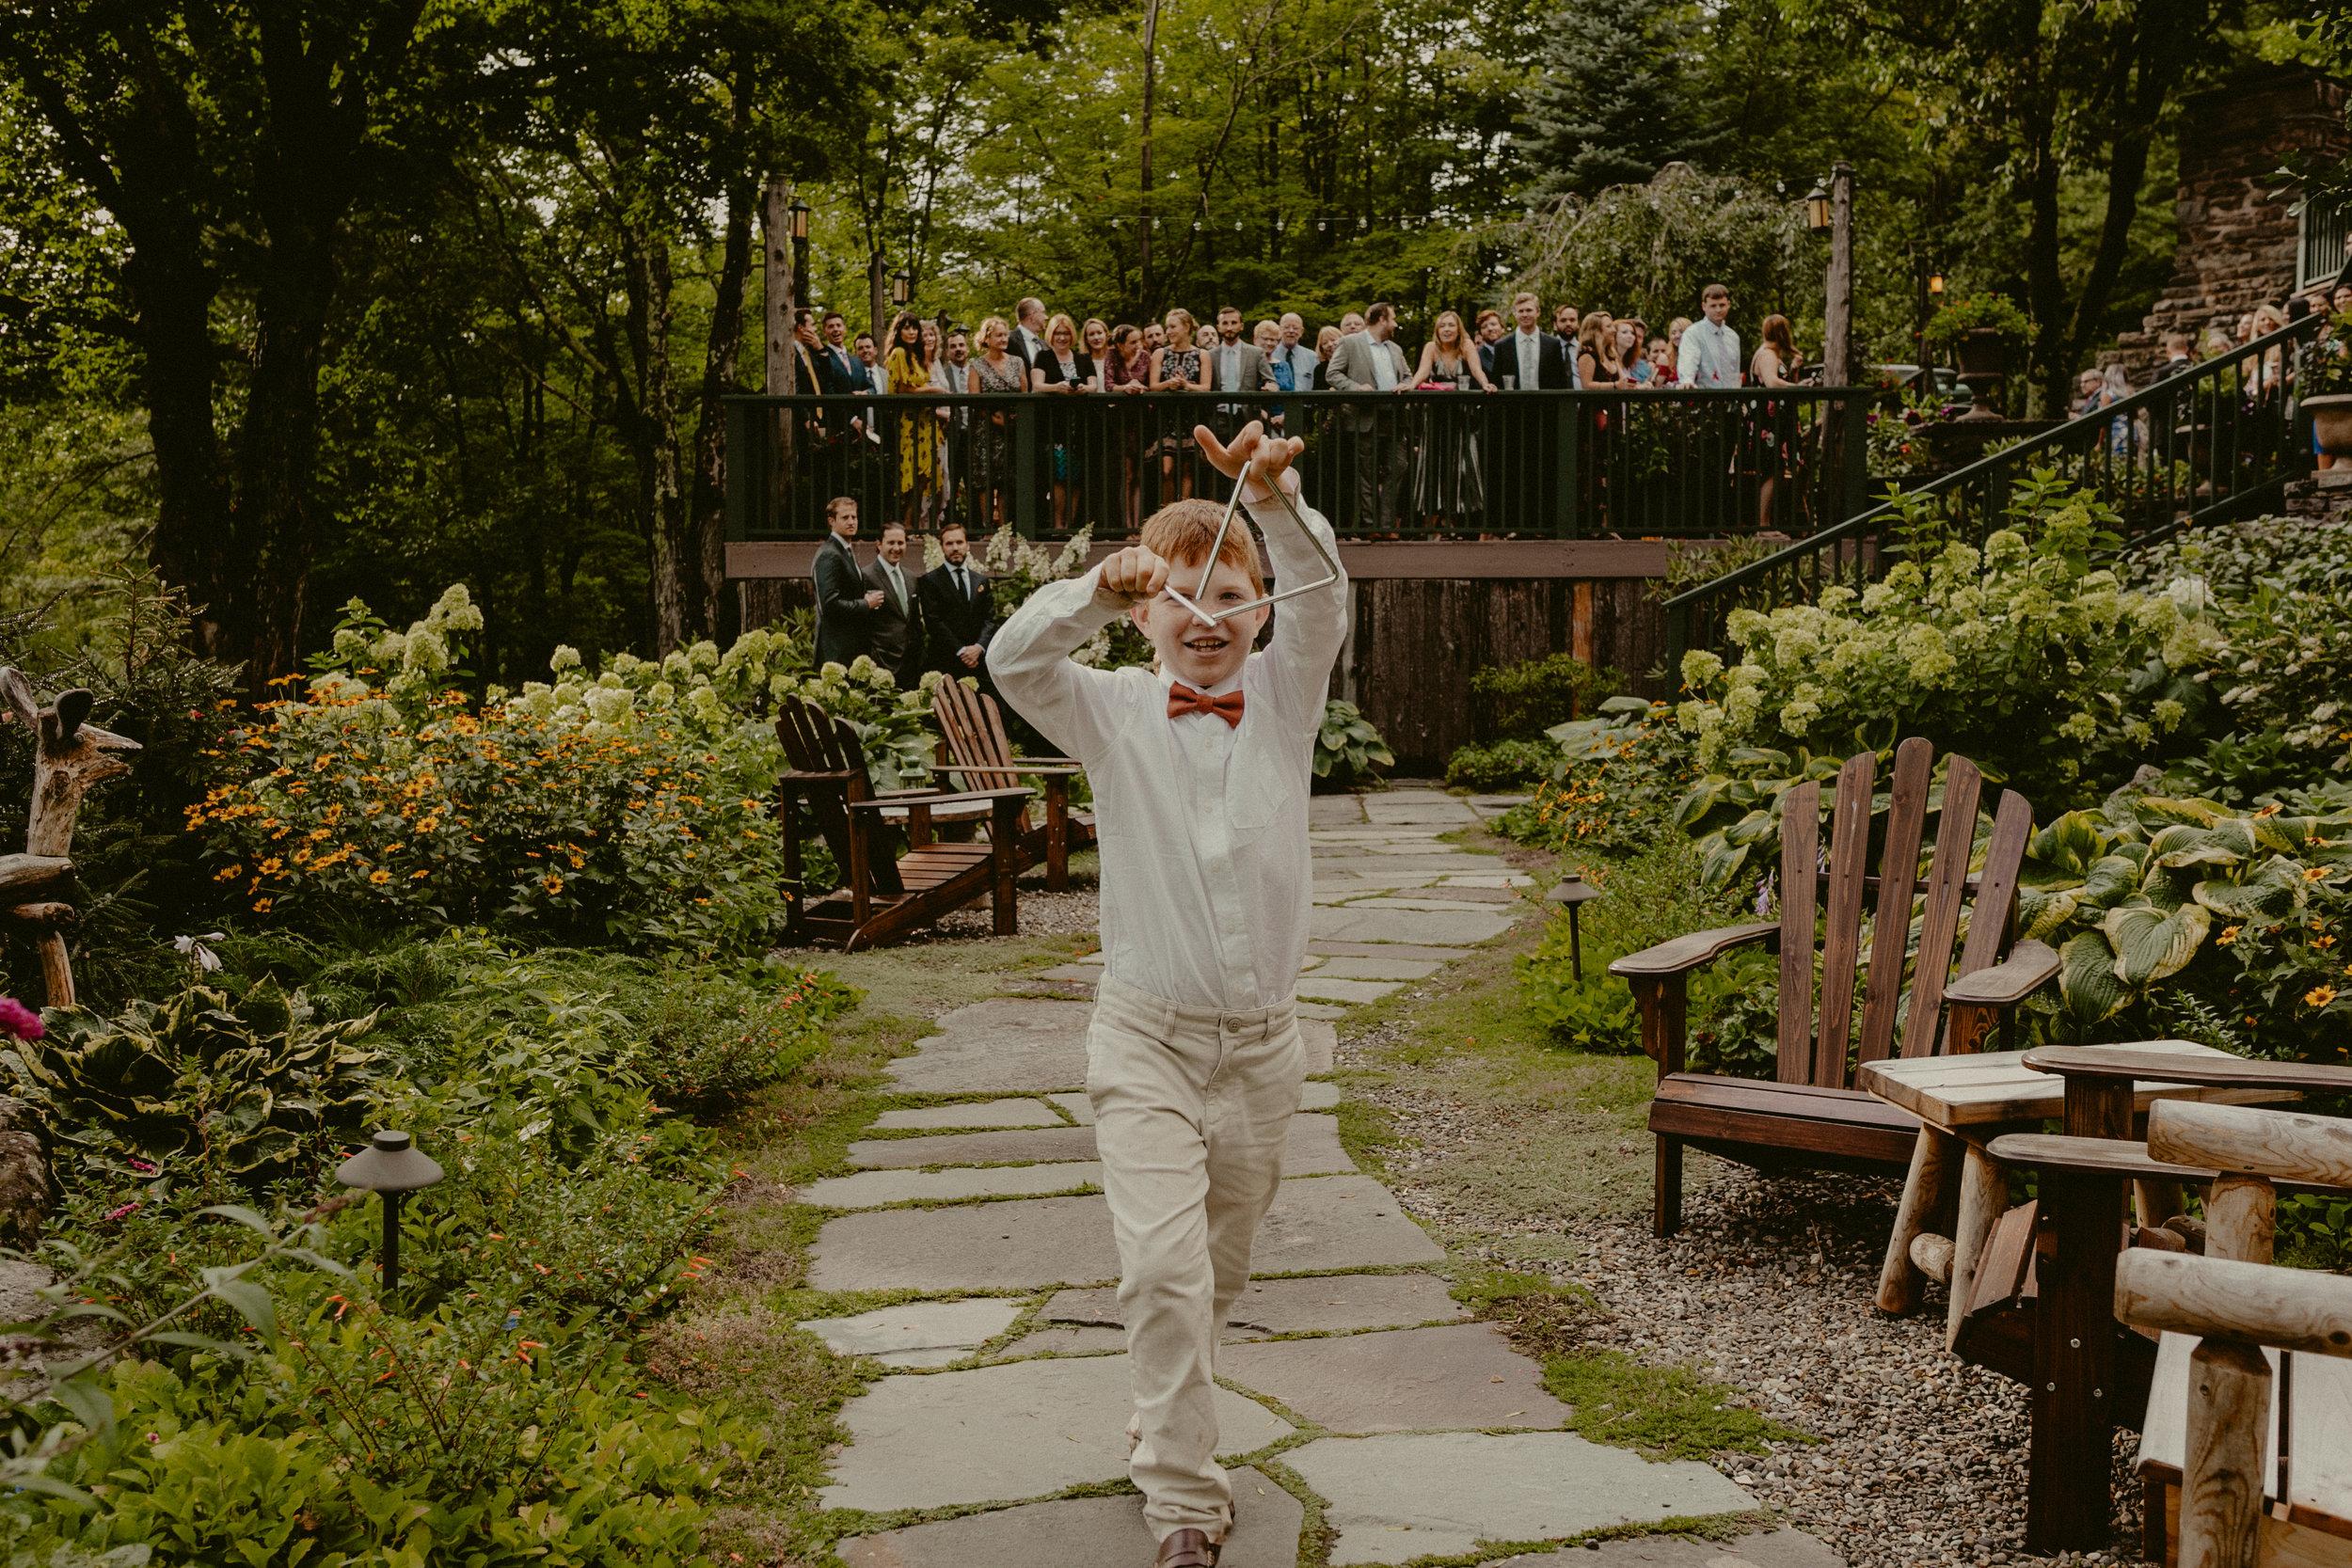 DEER_MOUNTAIN_INN_WEDDING_CHELLISE_MICHAEL_PHOTOGRAPHY-1339.jpg